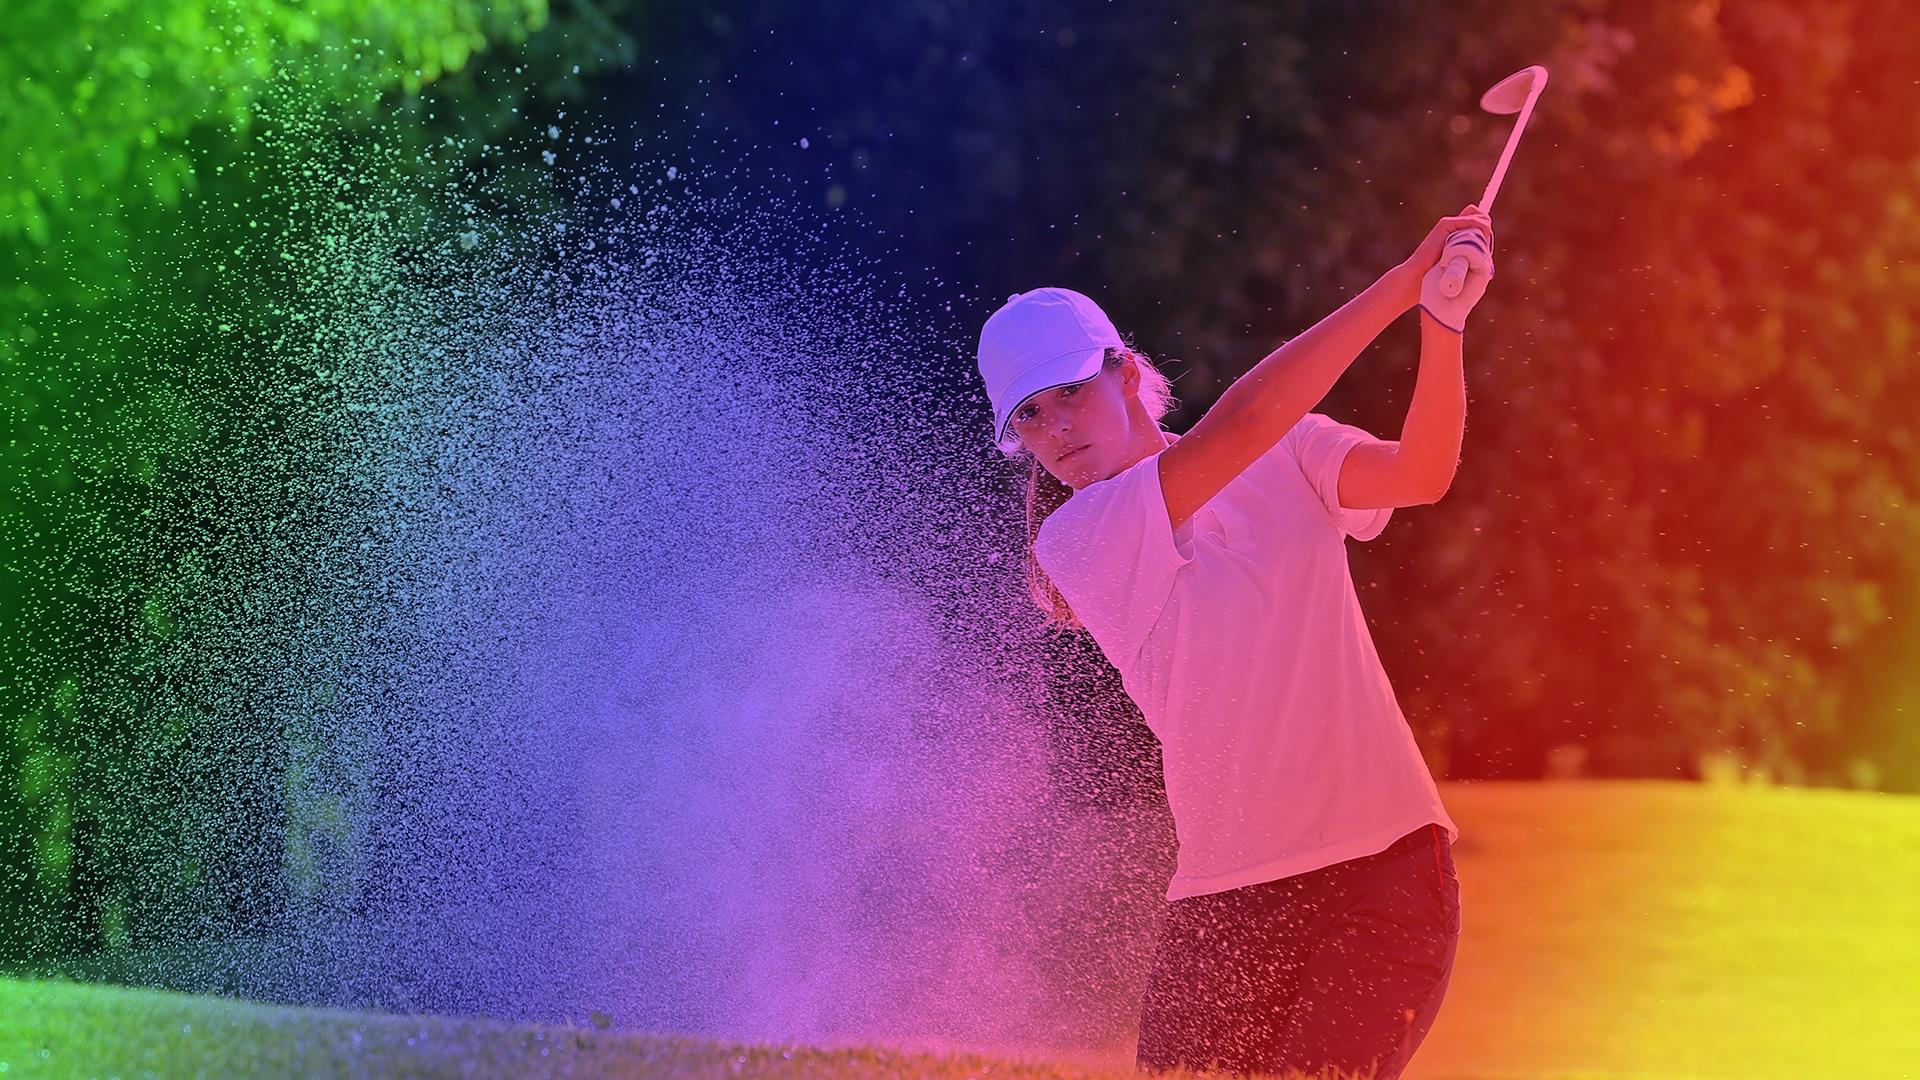 Start-3. WOWTOWELZ. Mikrofasertücher für Golf, GolfSport, Fitness, Outdoor, Wellness, ... in Top Qualität (© Foto: Batman57 / stock.adobe.com)